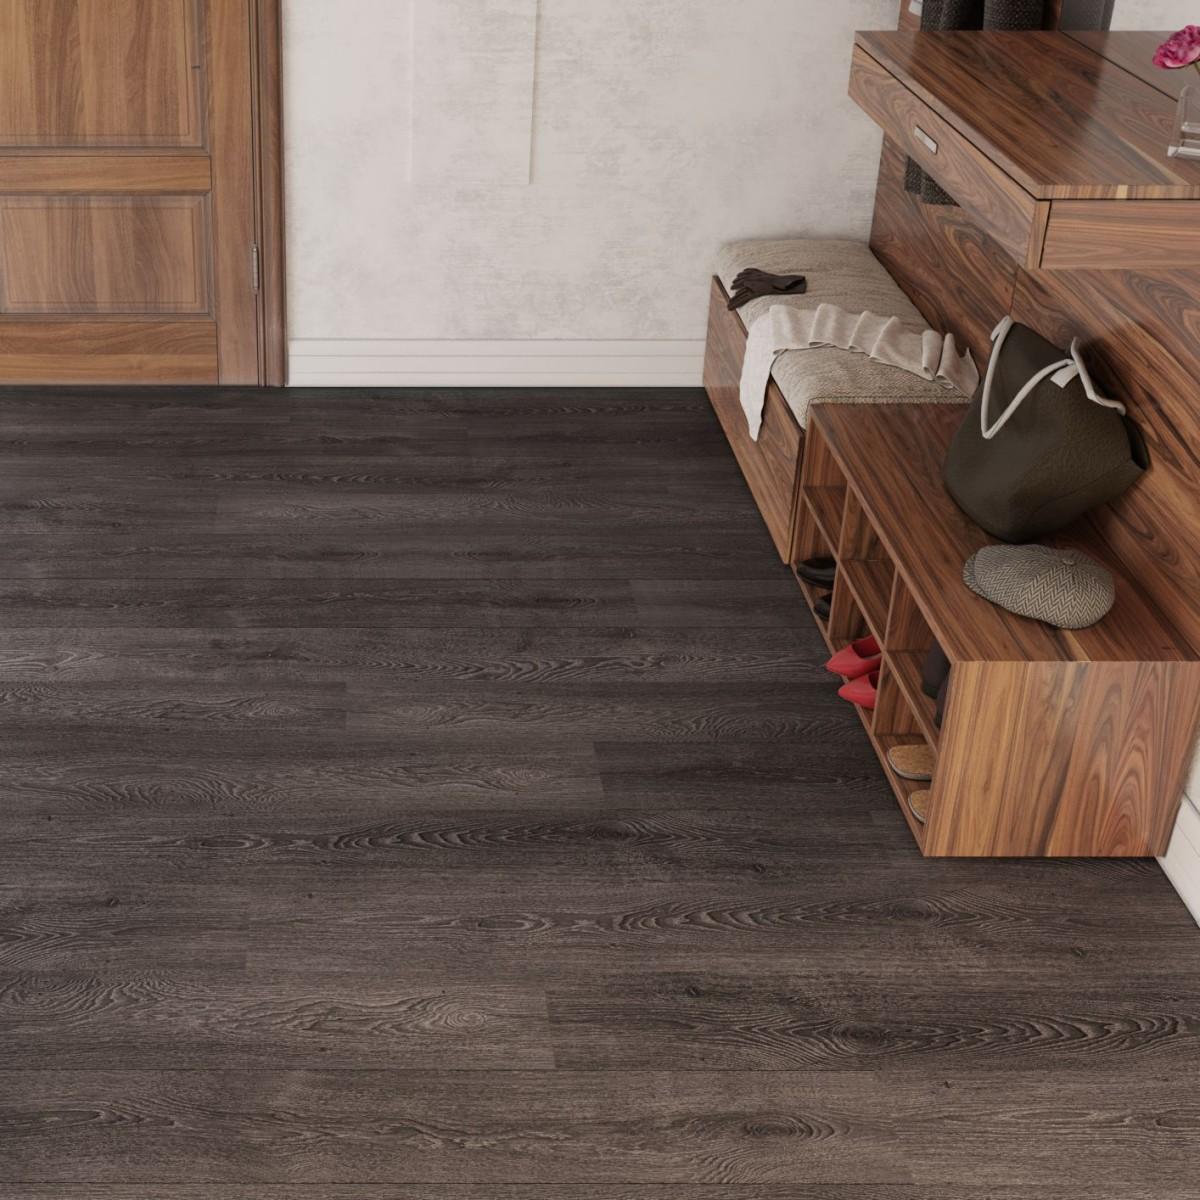 Ламинат Artens Дуб лоренц 33 класс толщина 8 мм 2.13 м²